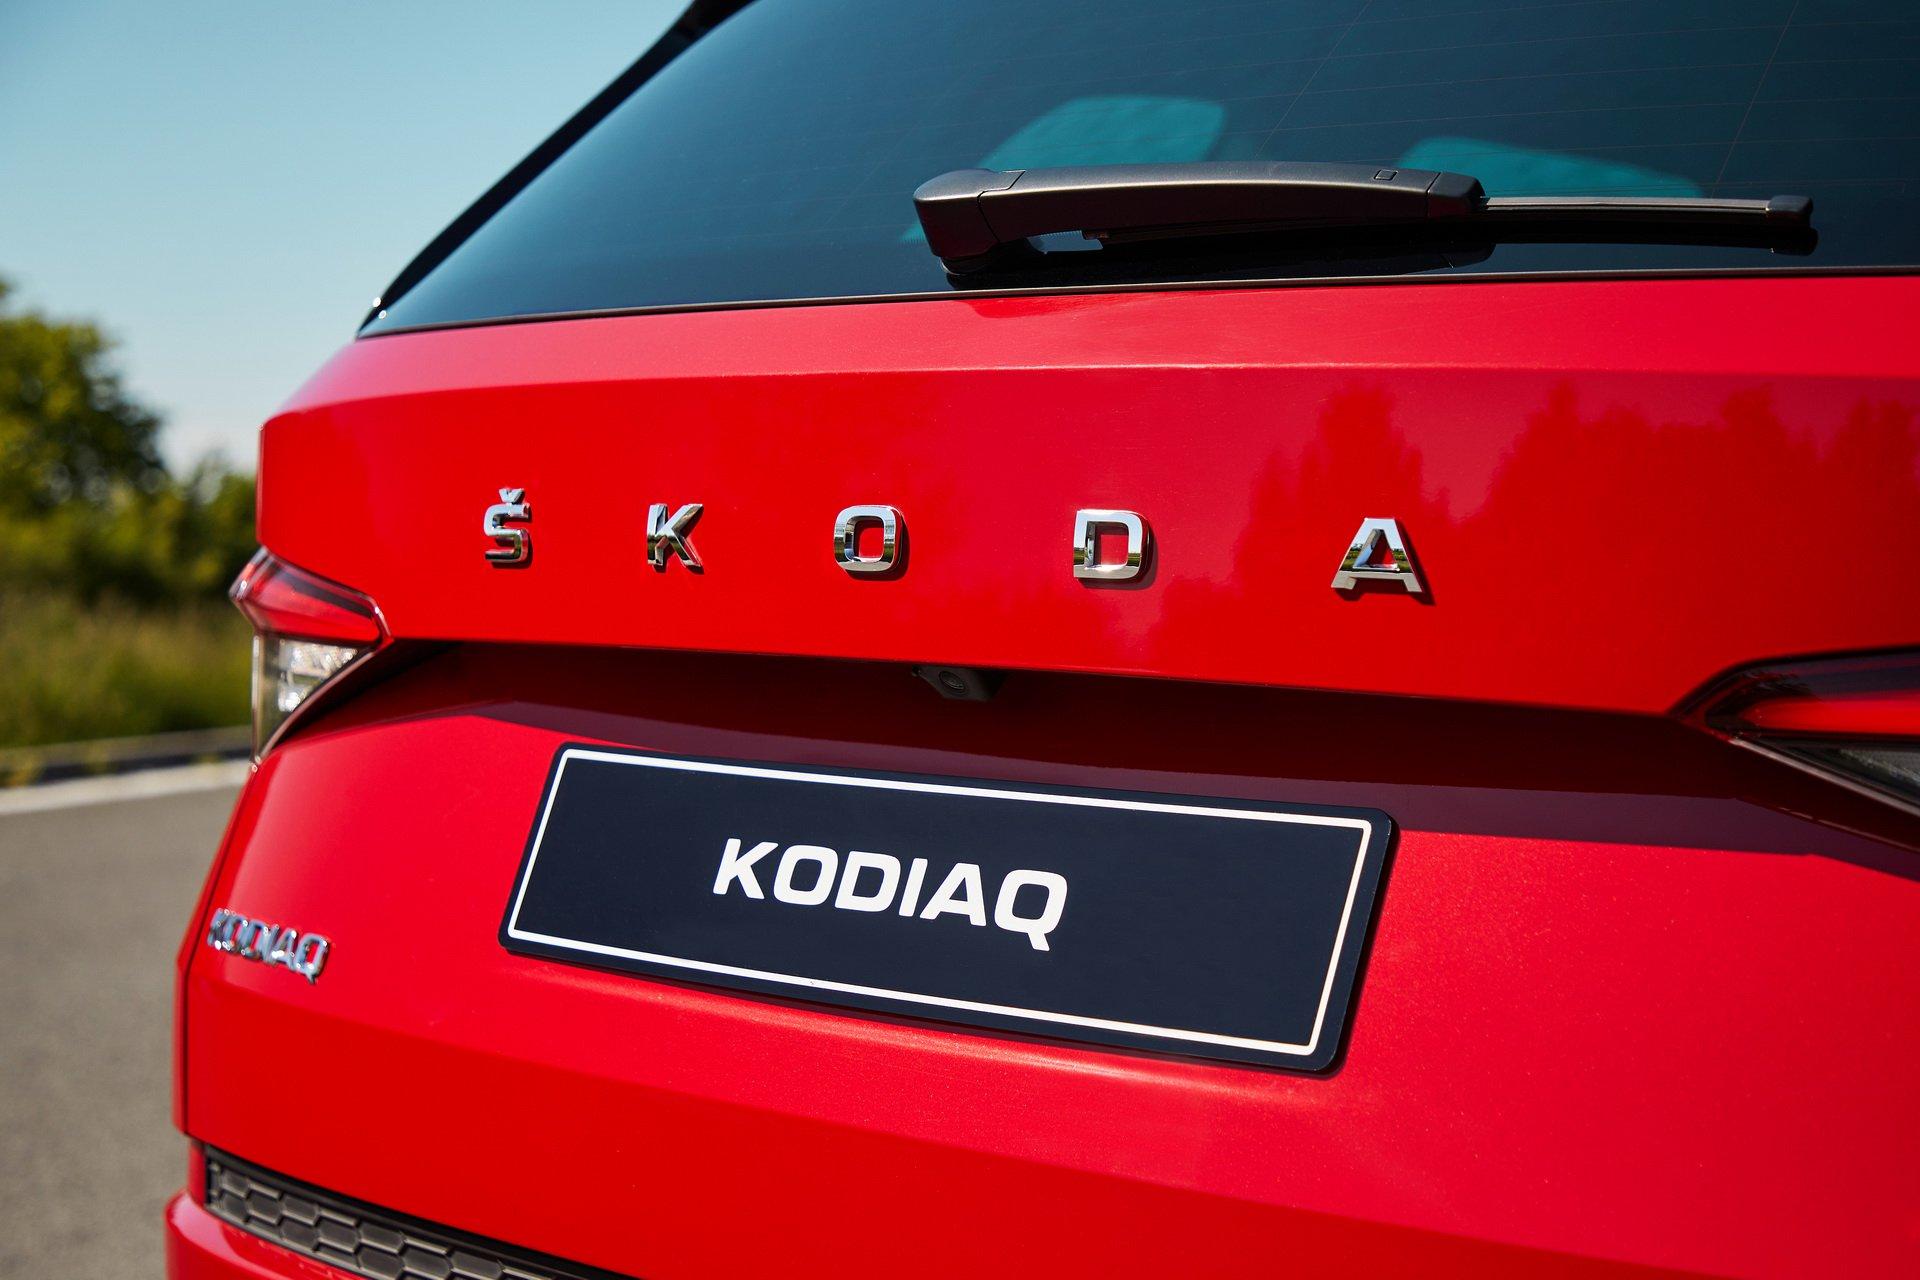 Skoda-Karoq-And-Kodiaq-2020-4